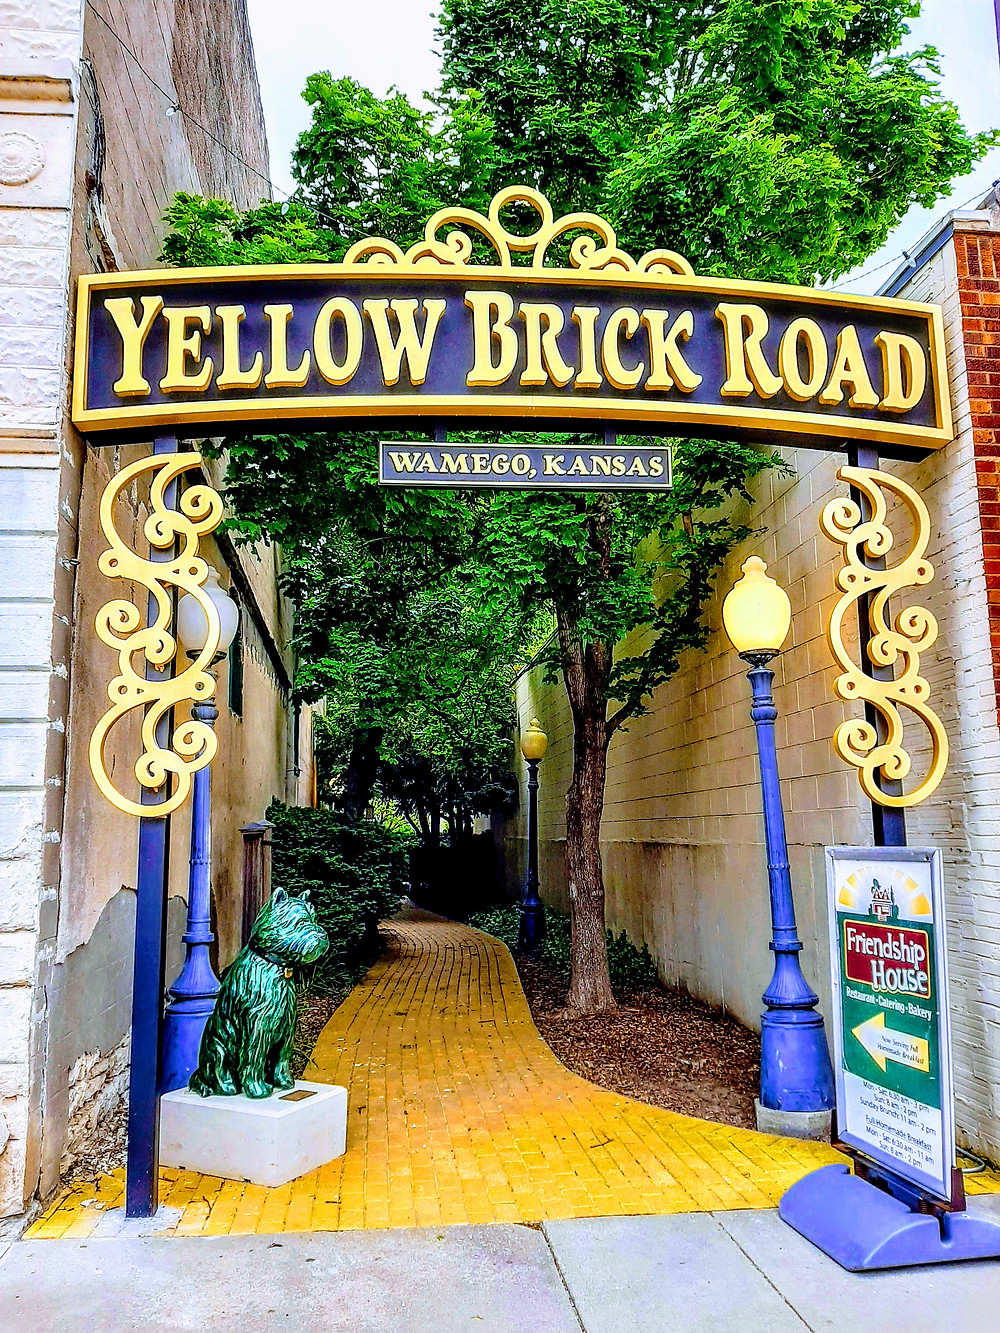 The Yellow Brick Road, Wamego Kansas